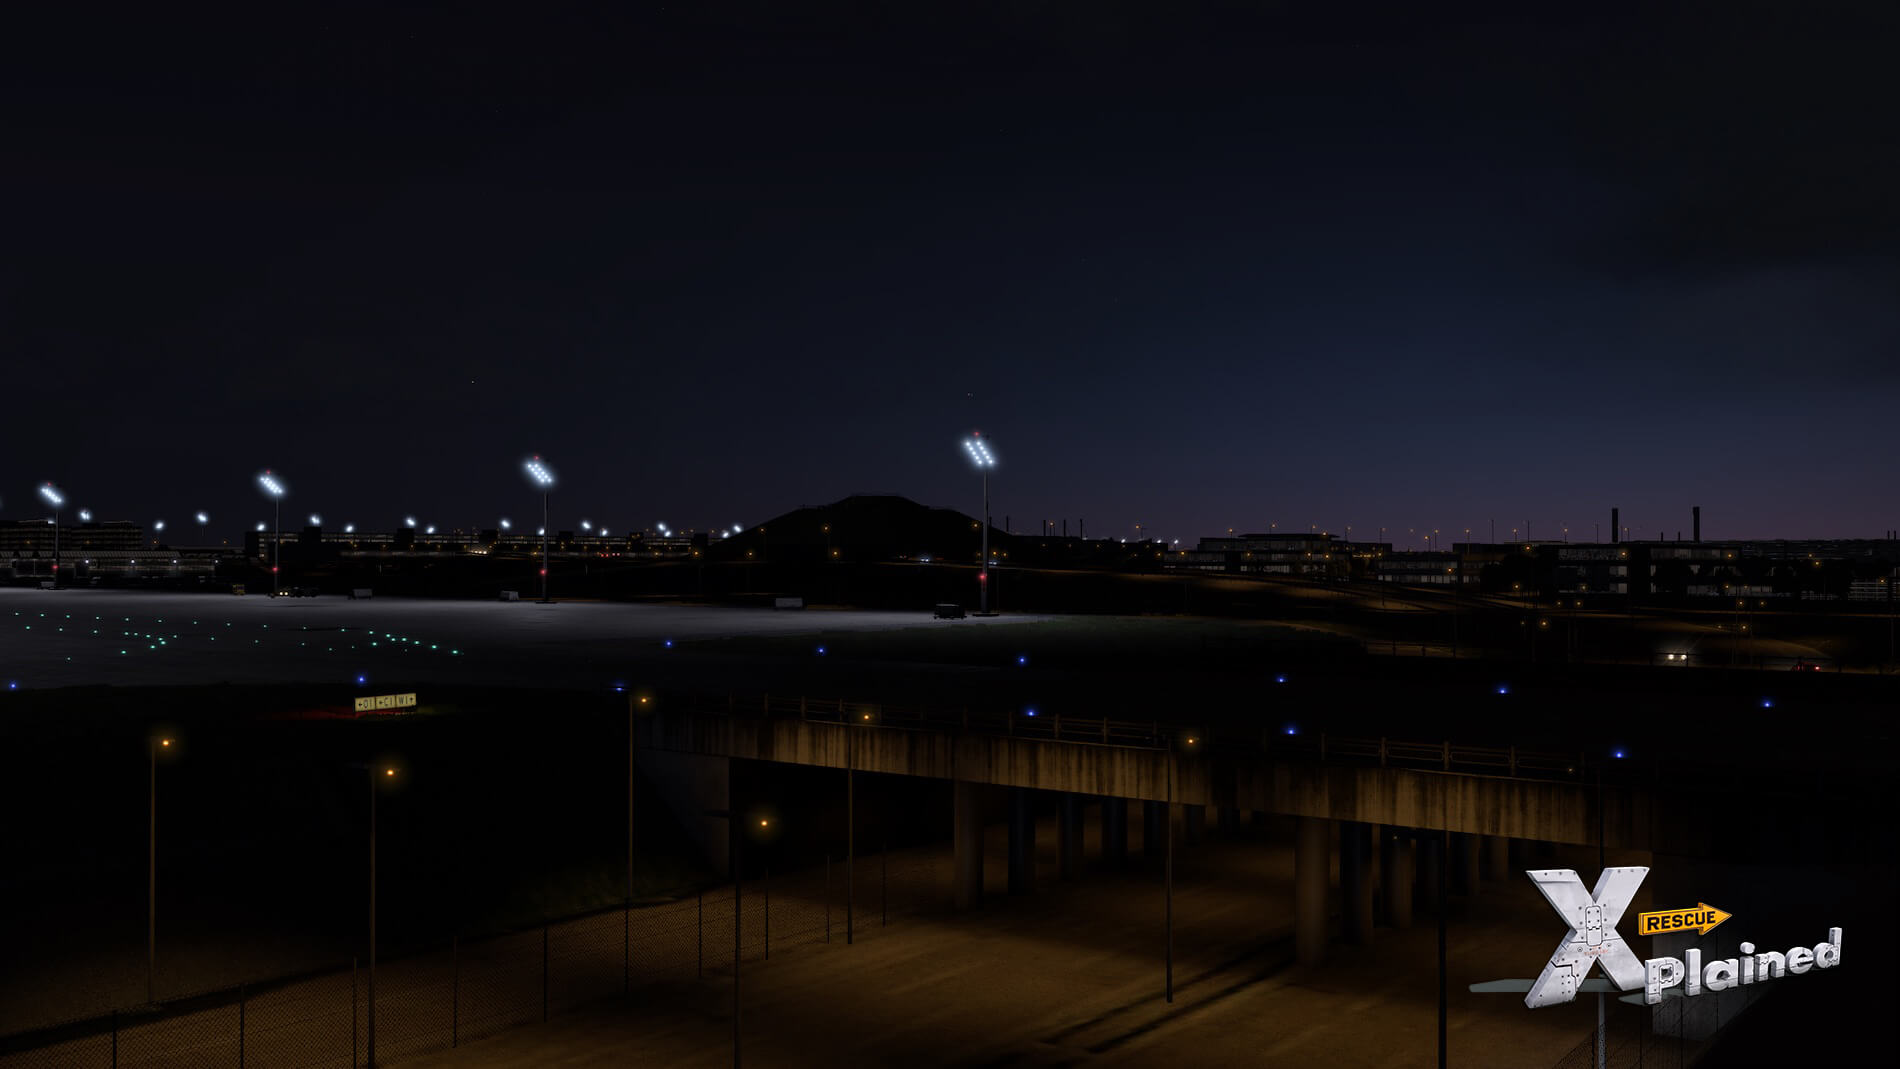 Evening-Impression-SFD-EDDM-10